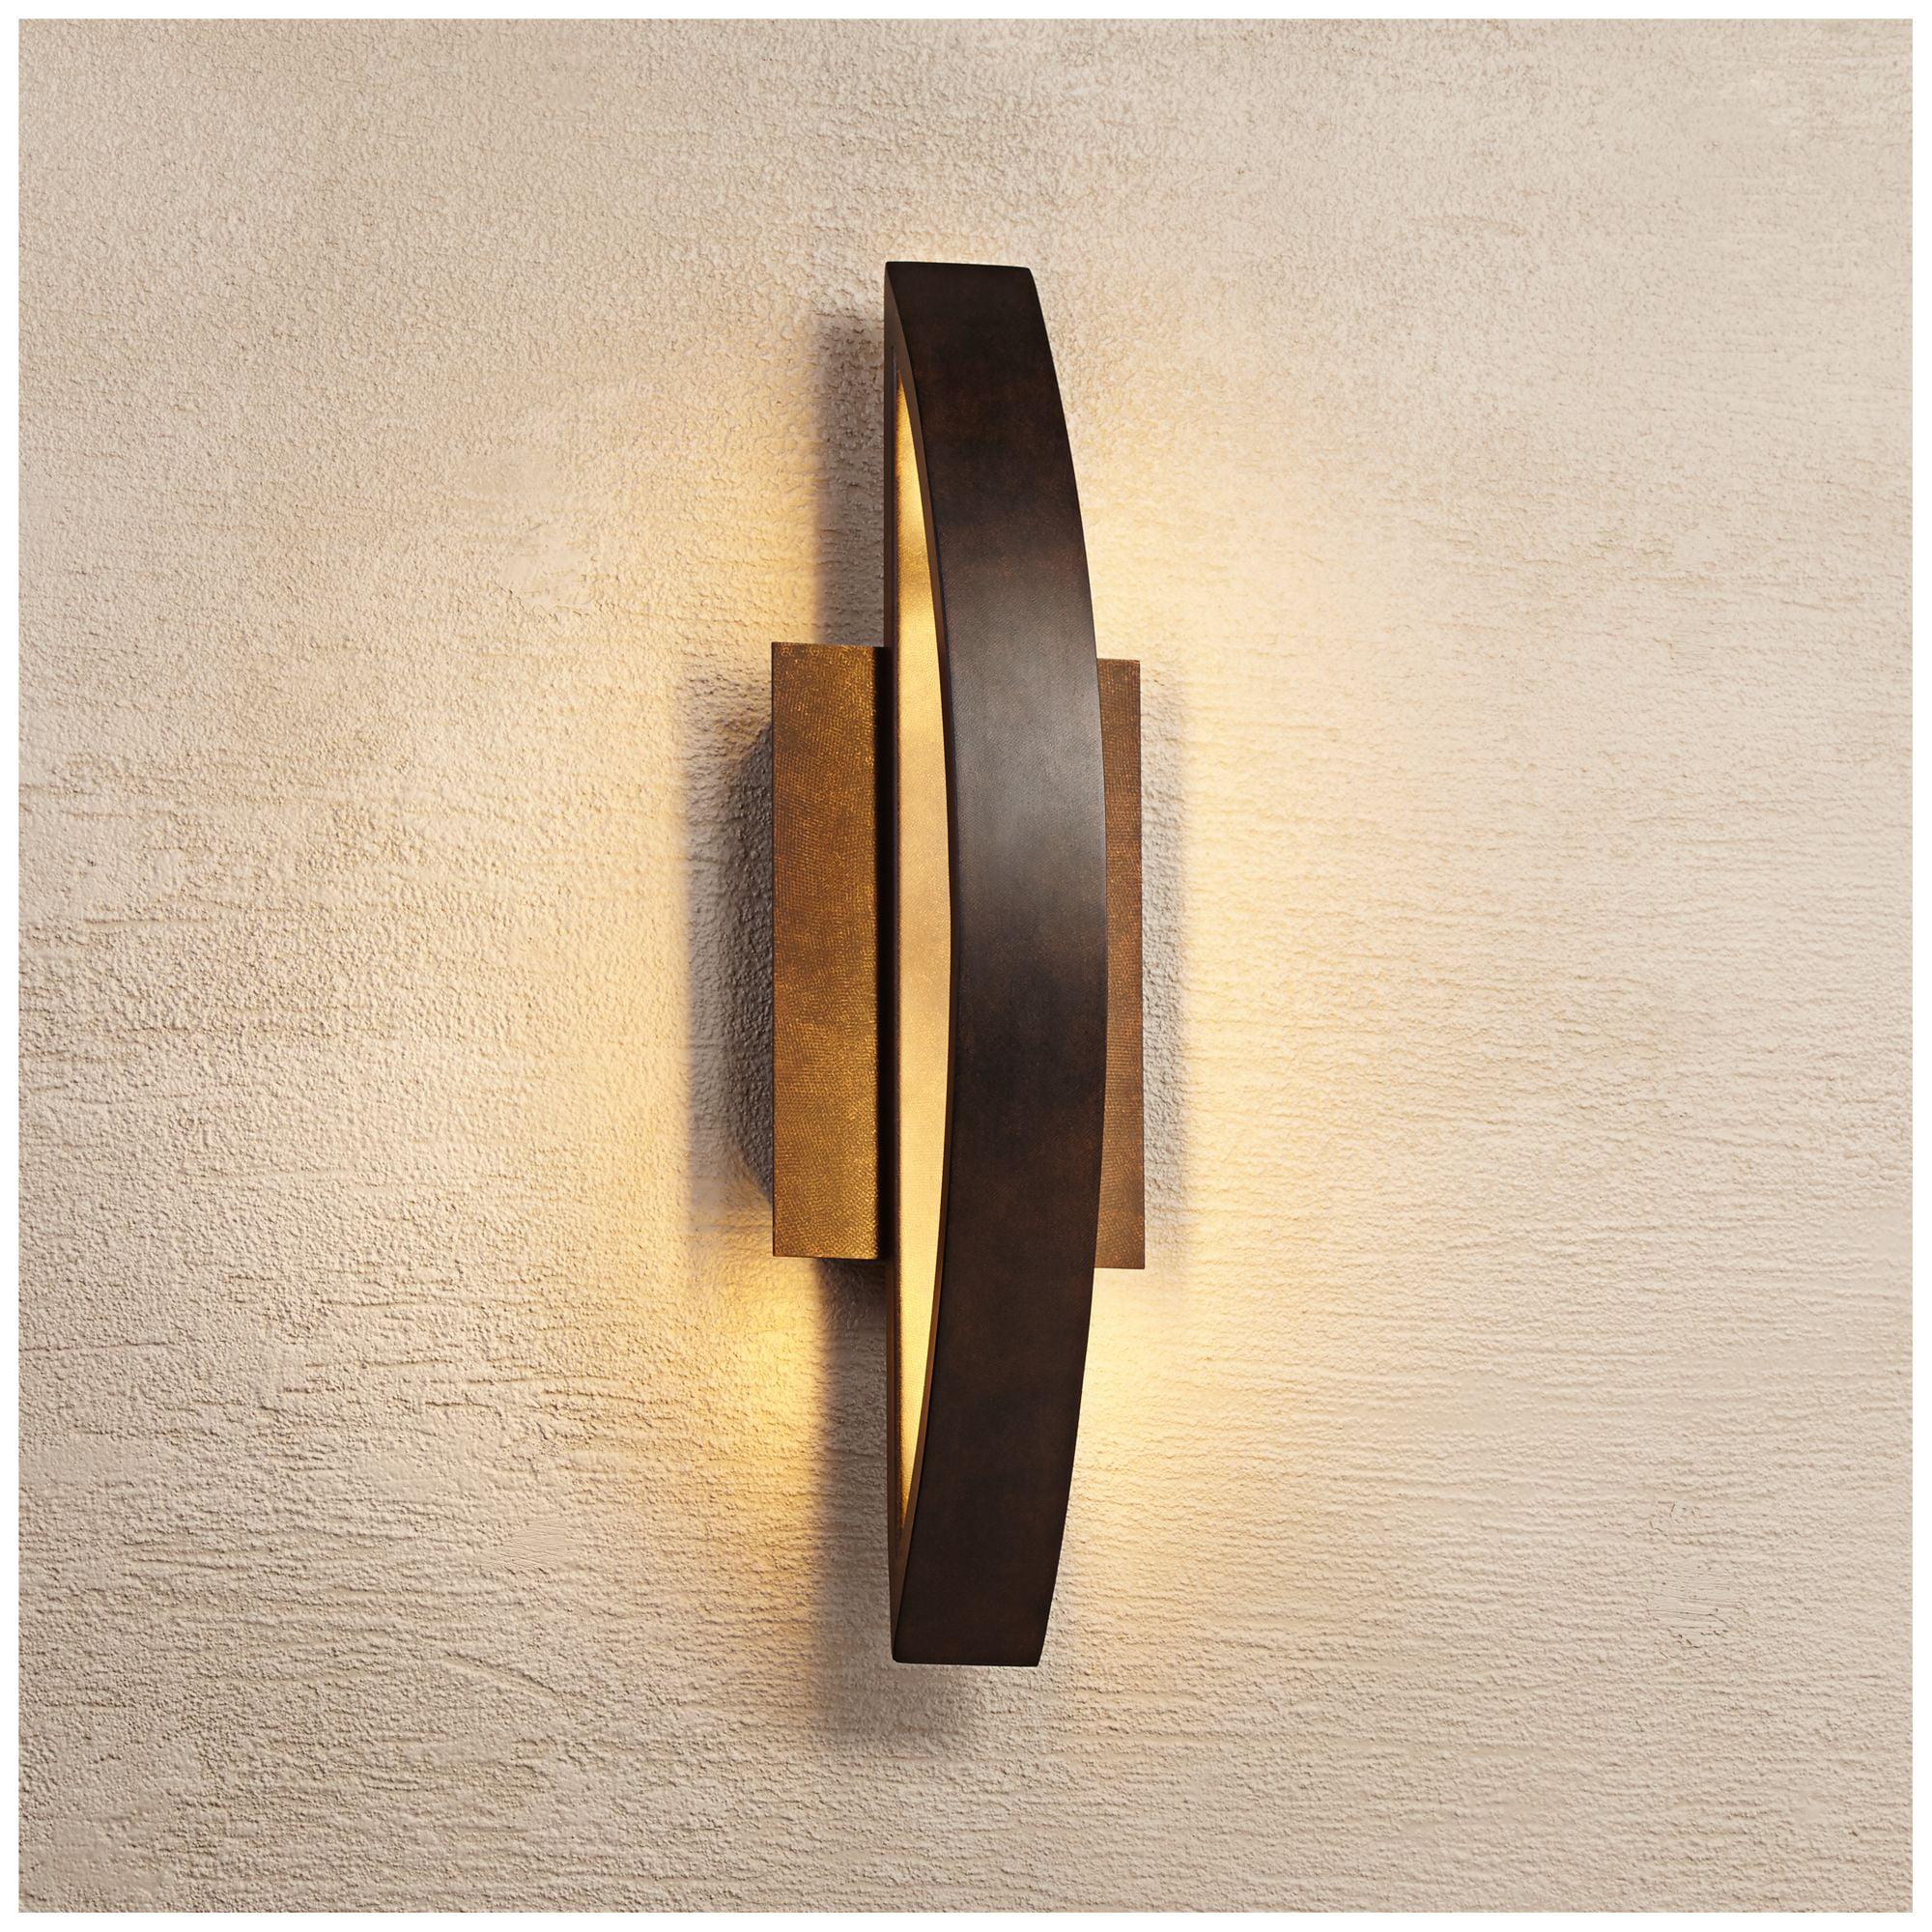 Possini Euro Design Possini Euro Coppered Arch Indoor-Outdoor Led Wall Sconce